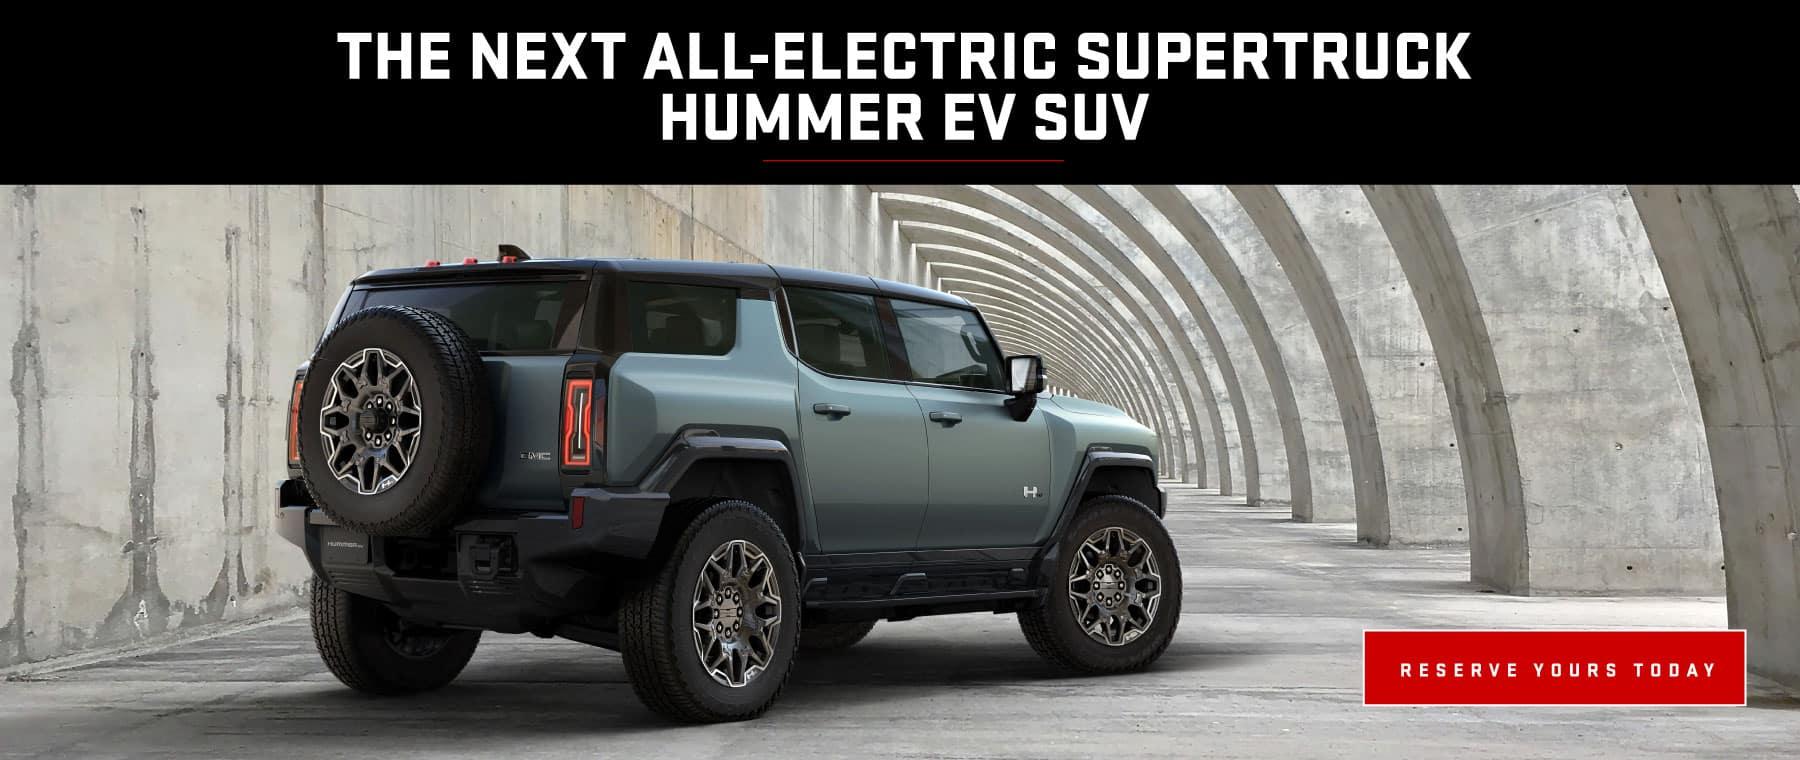 THE NEXT ALL-ELECTRIC SUPERTRUCK HUMMER EV SUV